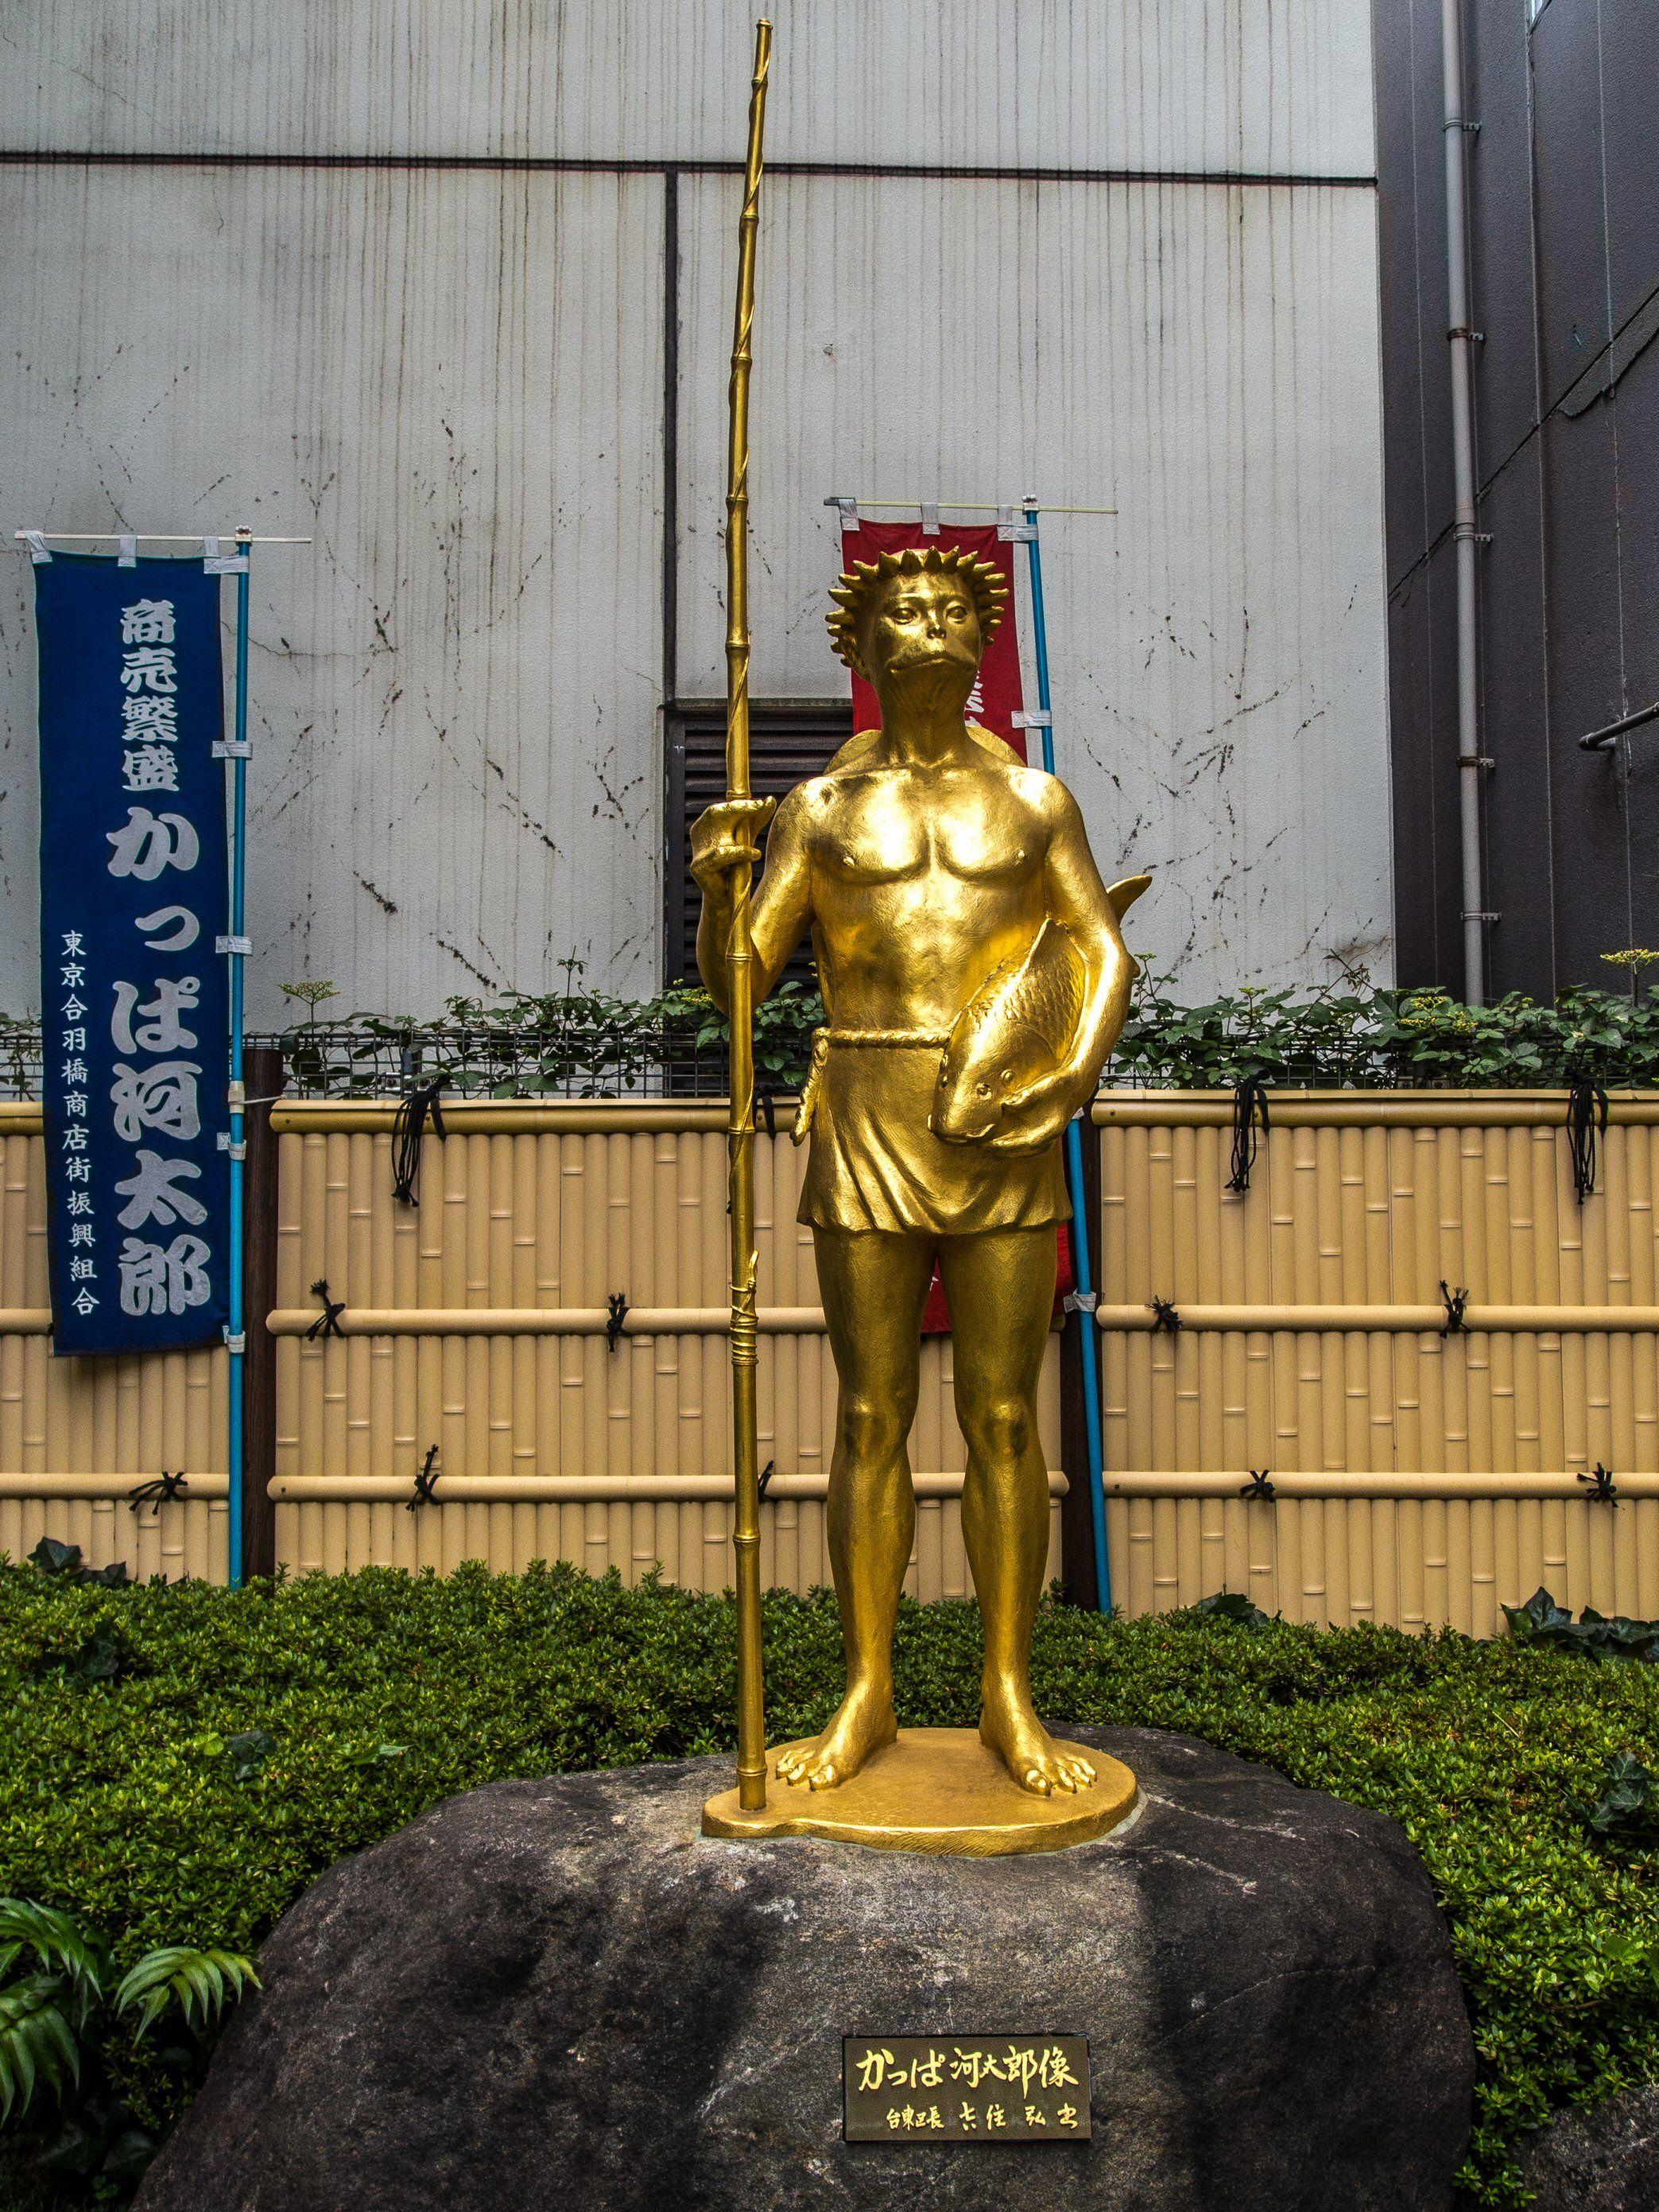 geautoriseerde site op voorraad gloednieuw Asakusa/Kappabashi Shitamachi Tanabata Matsuri 12/27 ...